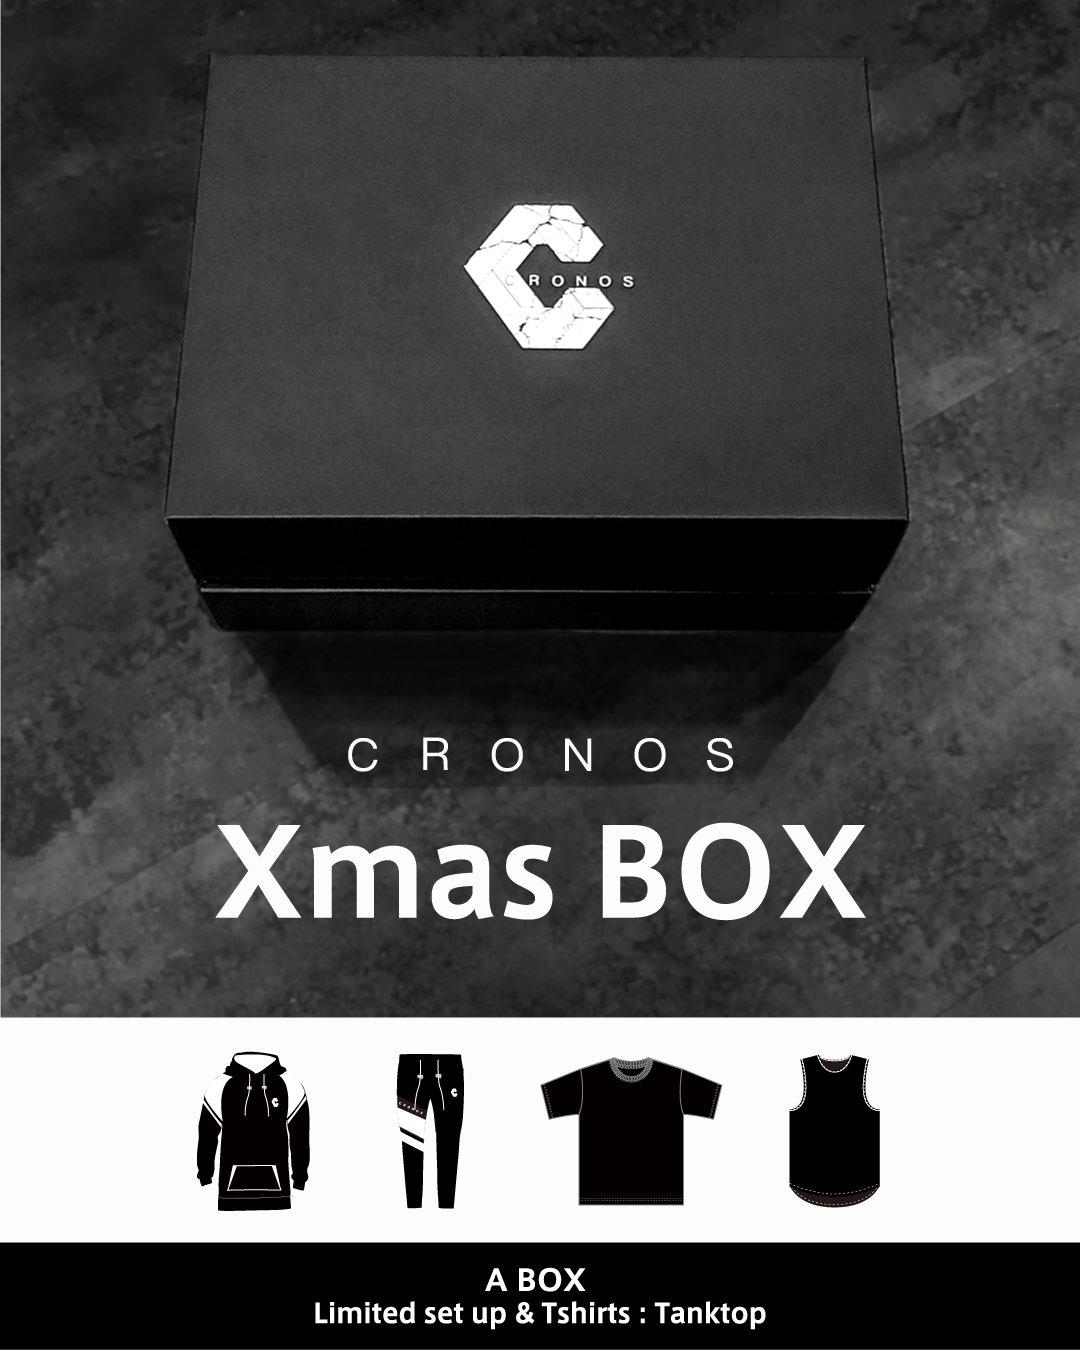 CRONOS XMAS BOX 【A】